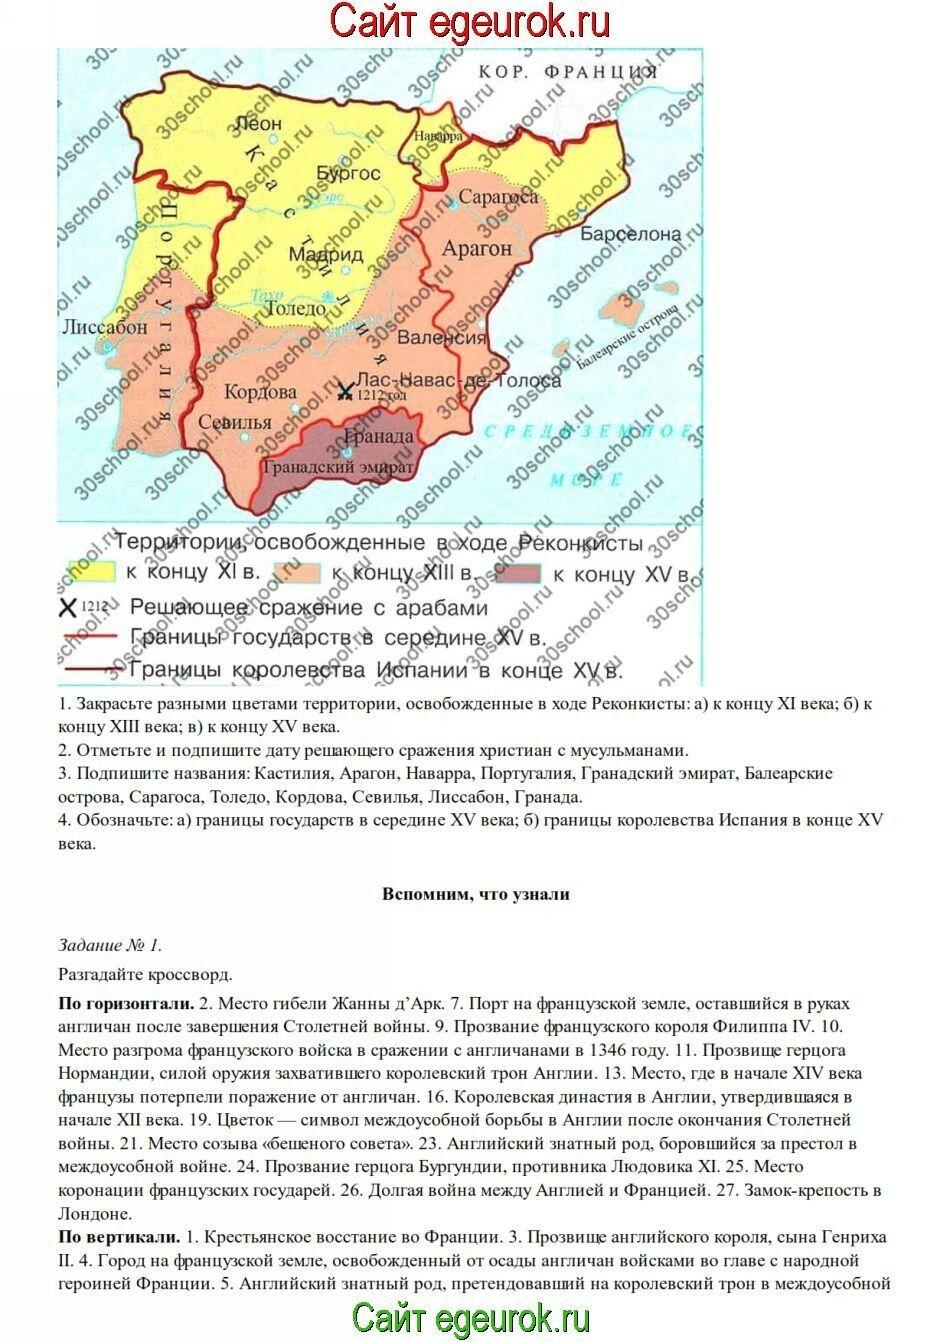 Сочинение на тему зима на татарском языке 6 класс